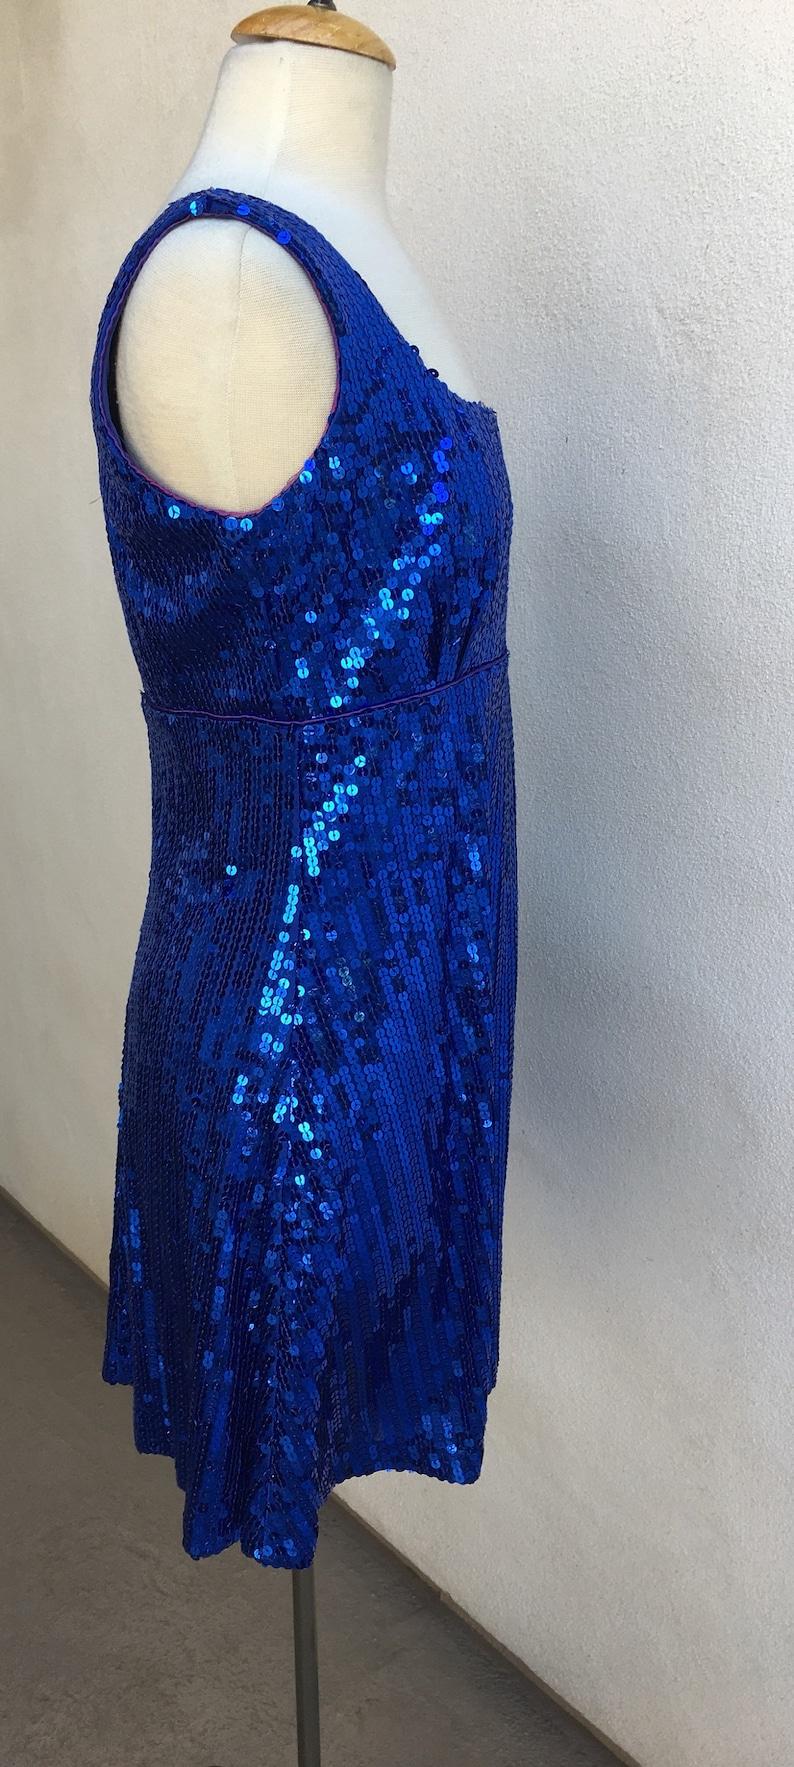 Vintage neon blue sequins party dress empire waist lined short Sz 13 14 Betsy & Adams